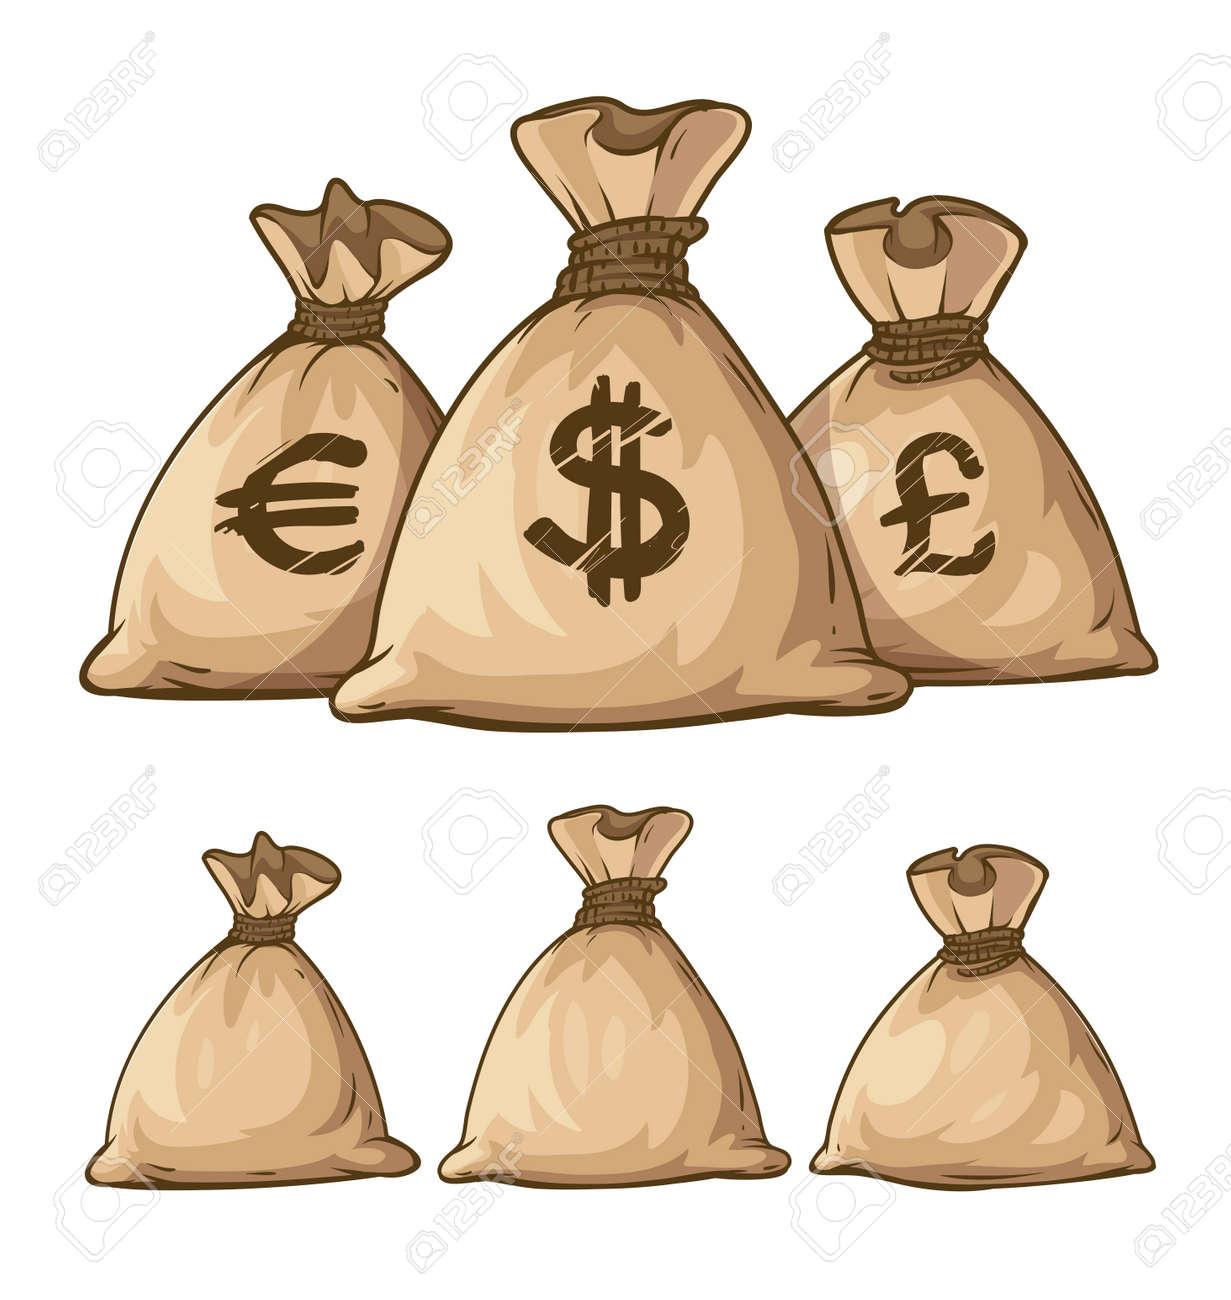 Cartoon full sacks with money. Eps10 vector illustration. Isolated on white background Stock Vector - 41114041